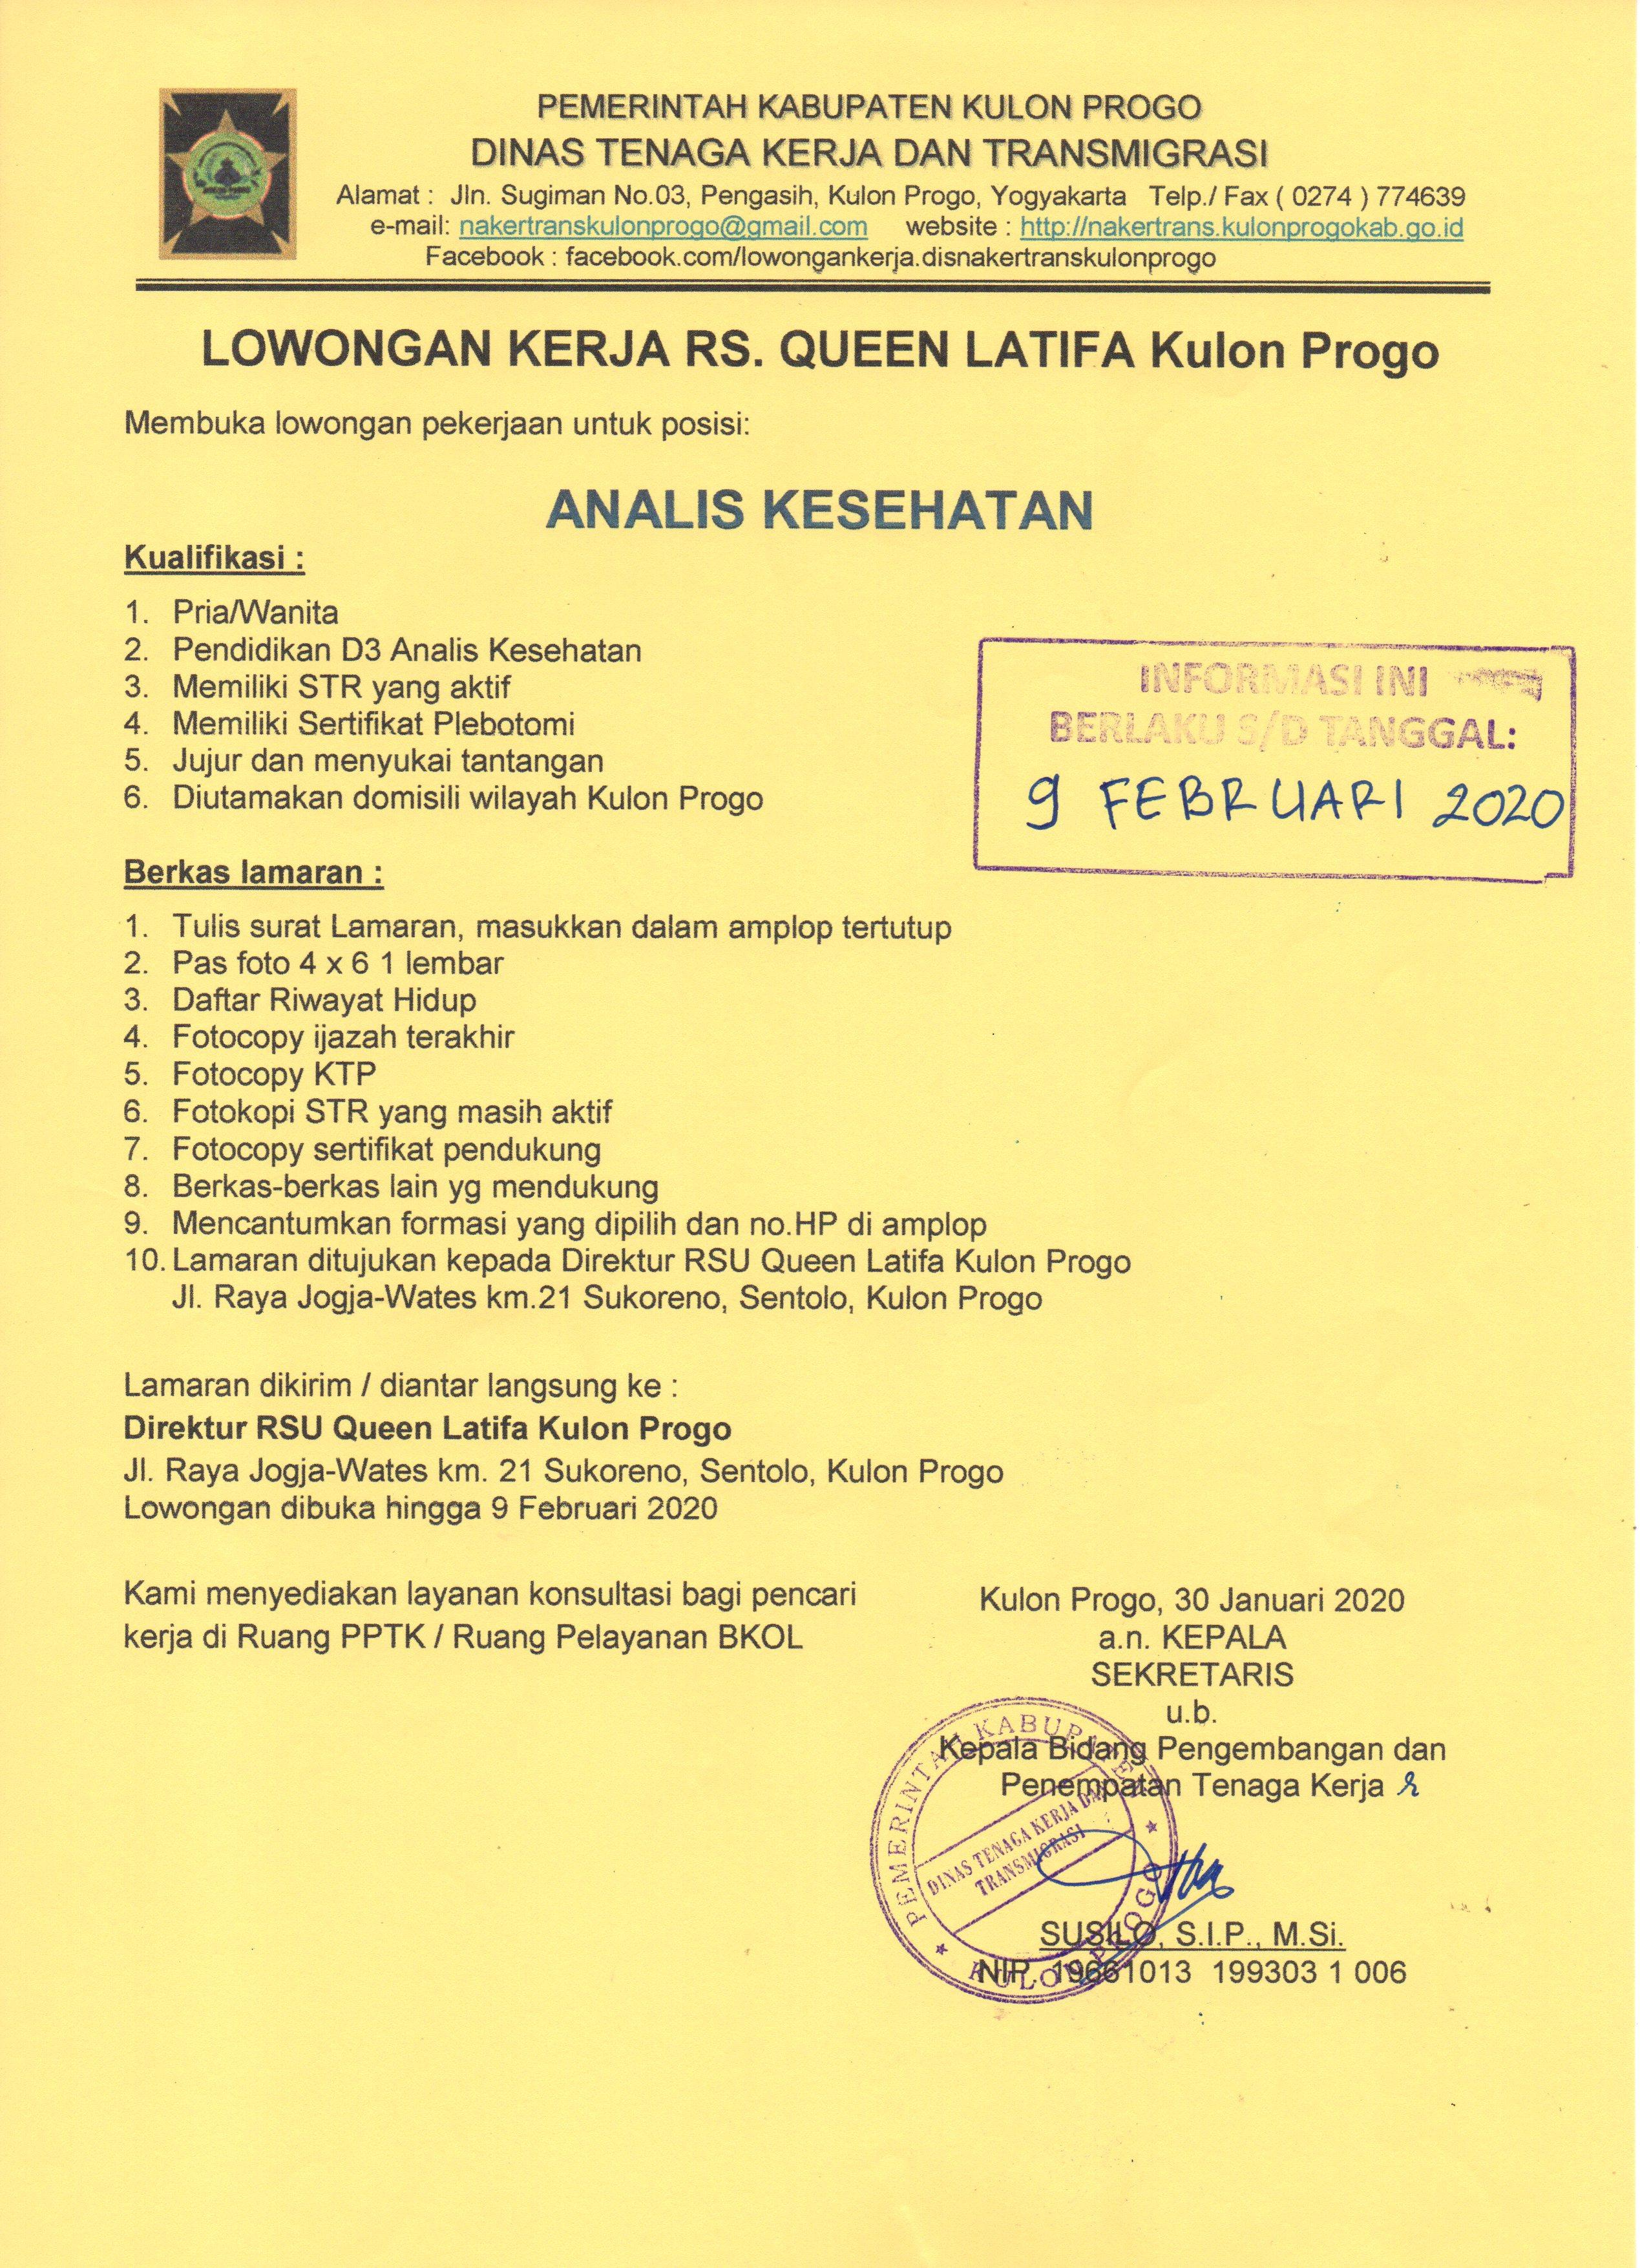 Disnakertrans Lowongan Kerja Analis Kesehatan Di Rs Queen Latifa Kulon Progo